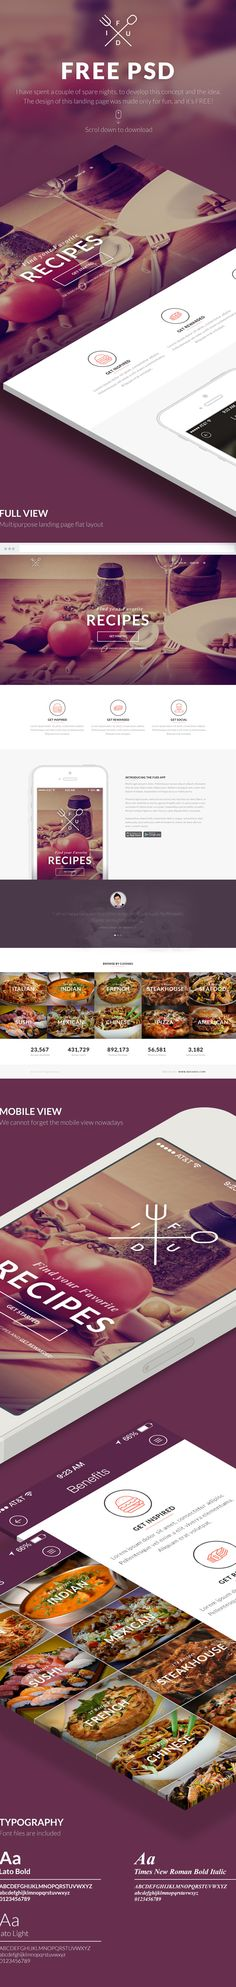 FREE PSD, Multipurpose Landing Page! by Kristijan Binski, via Behance